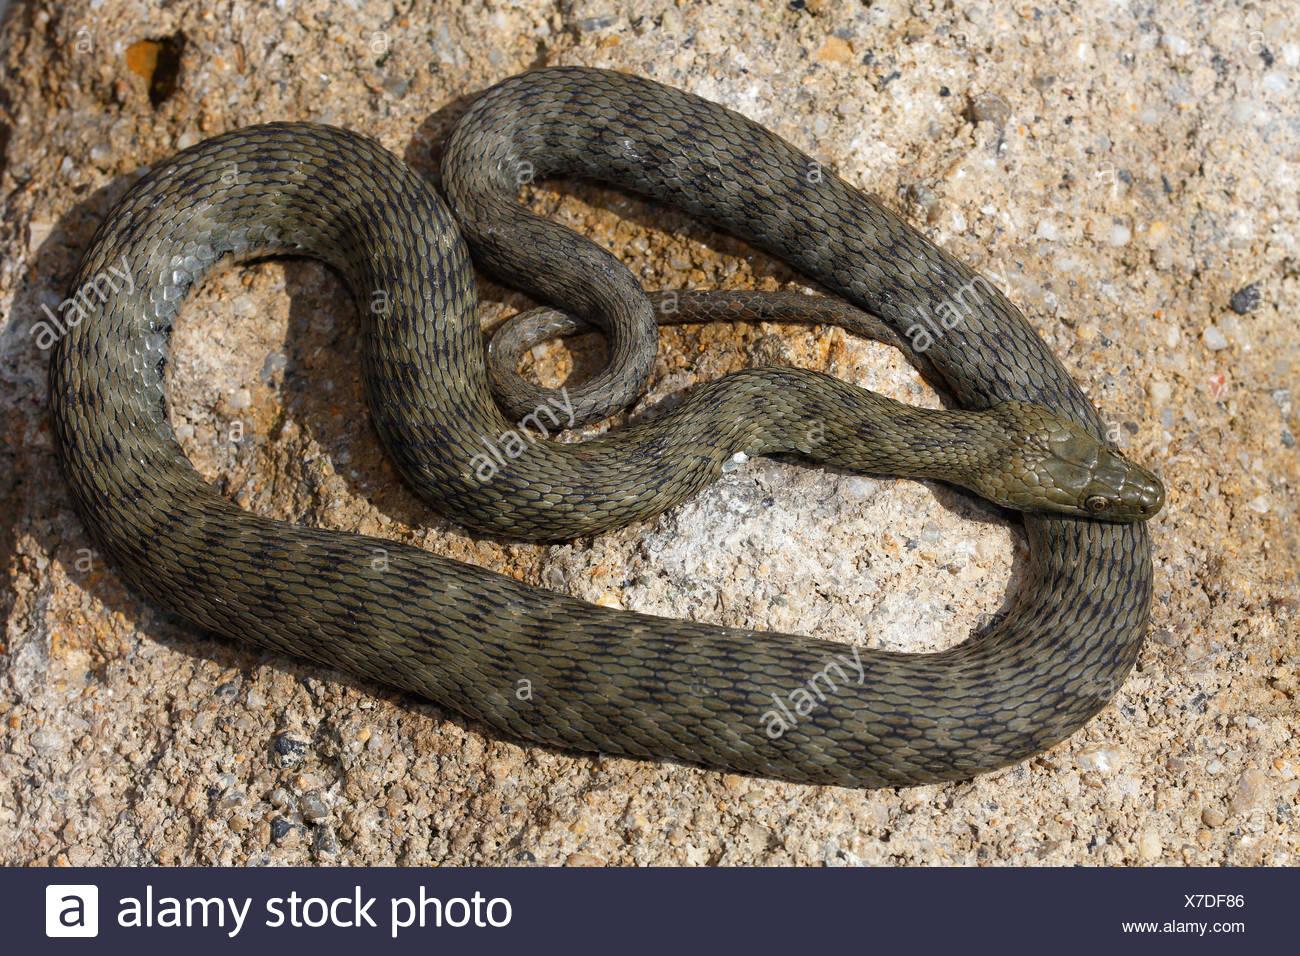 Dice Snake (Natrix tessellata) basking on stone, Hungary - Stock Image